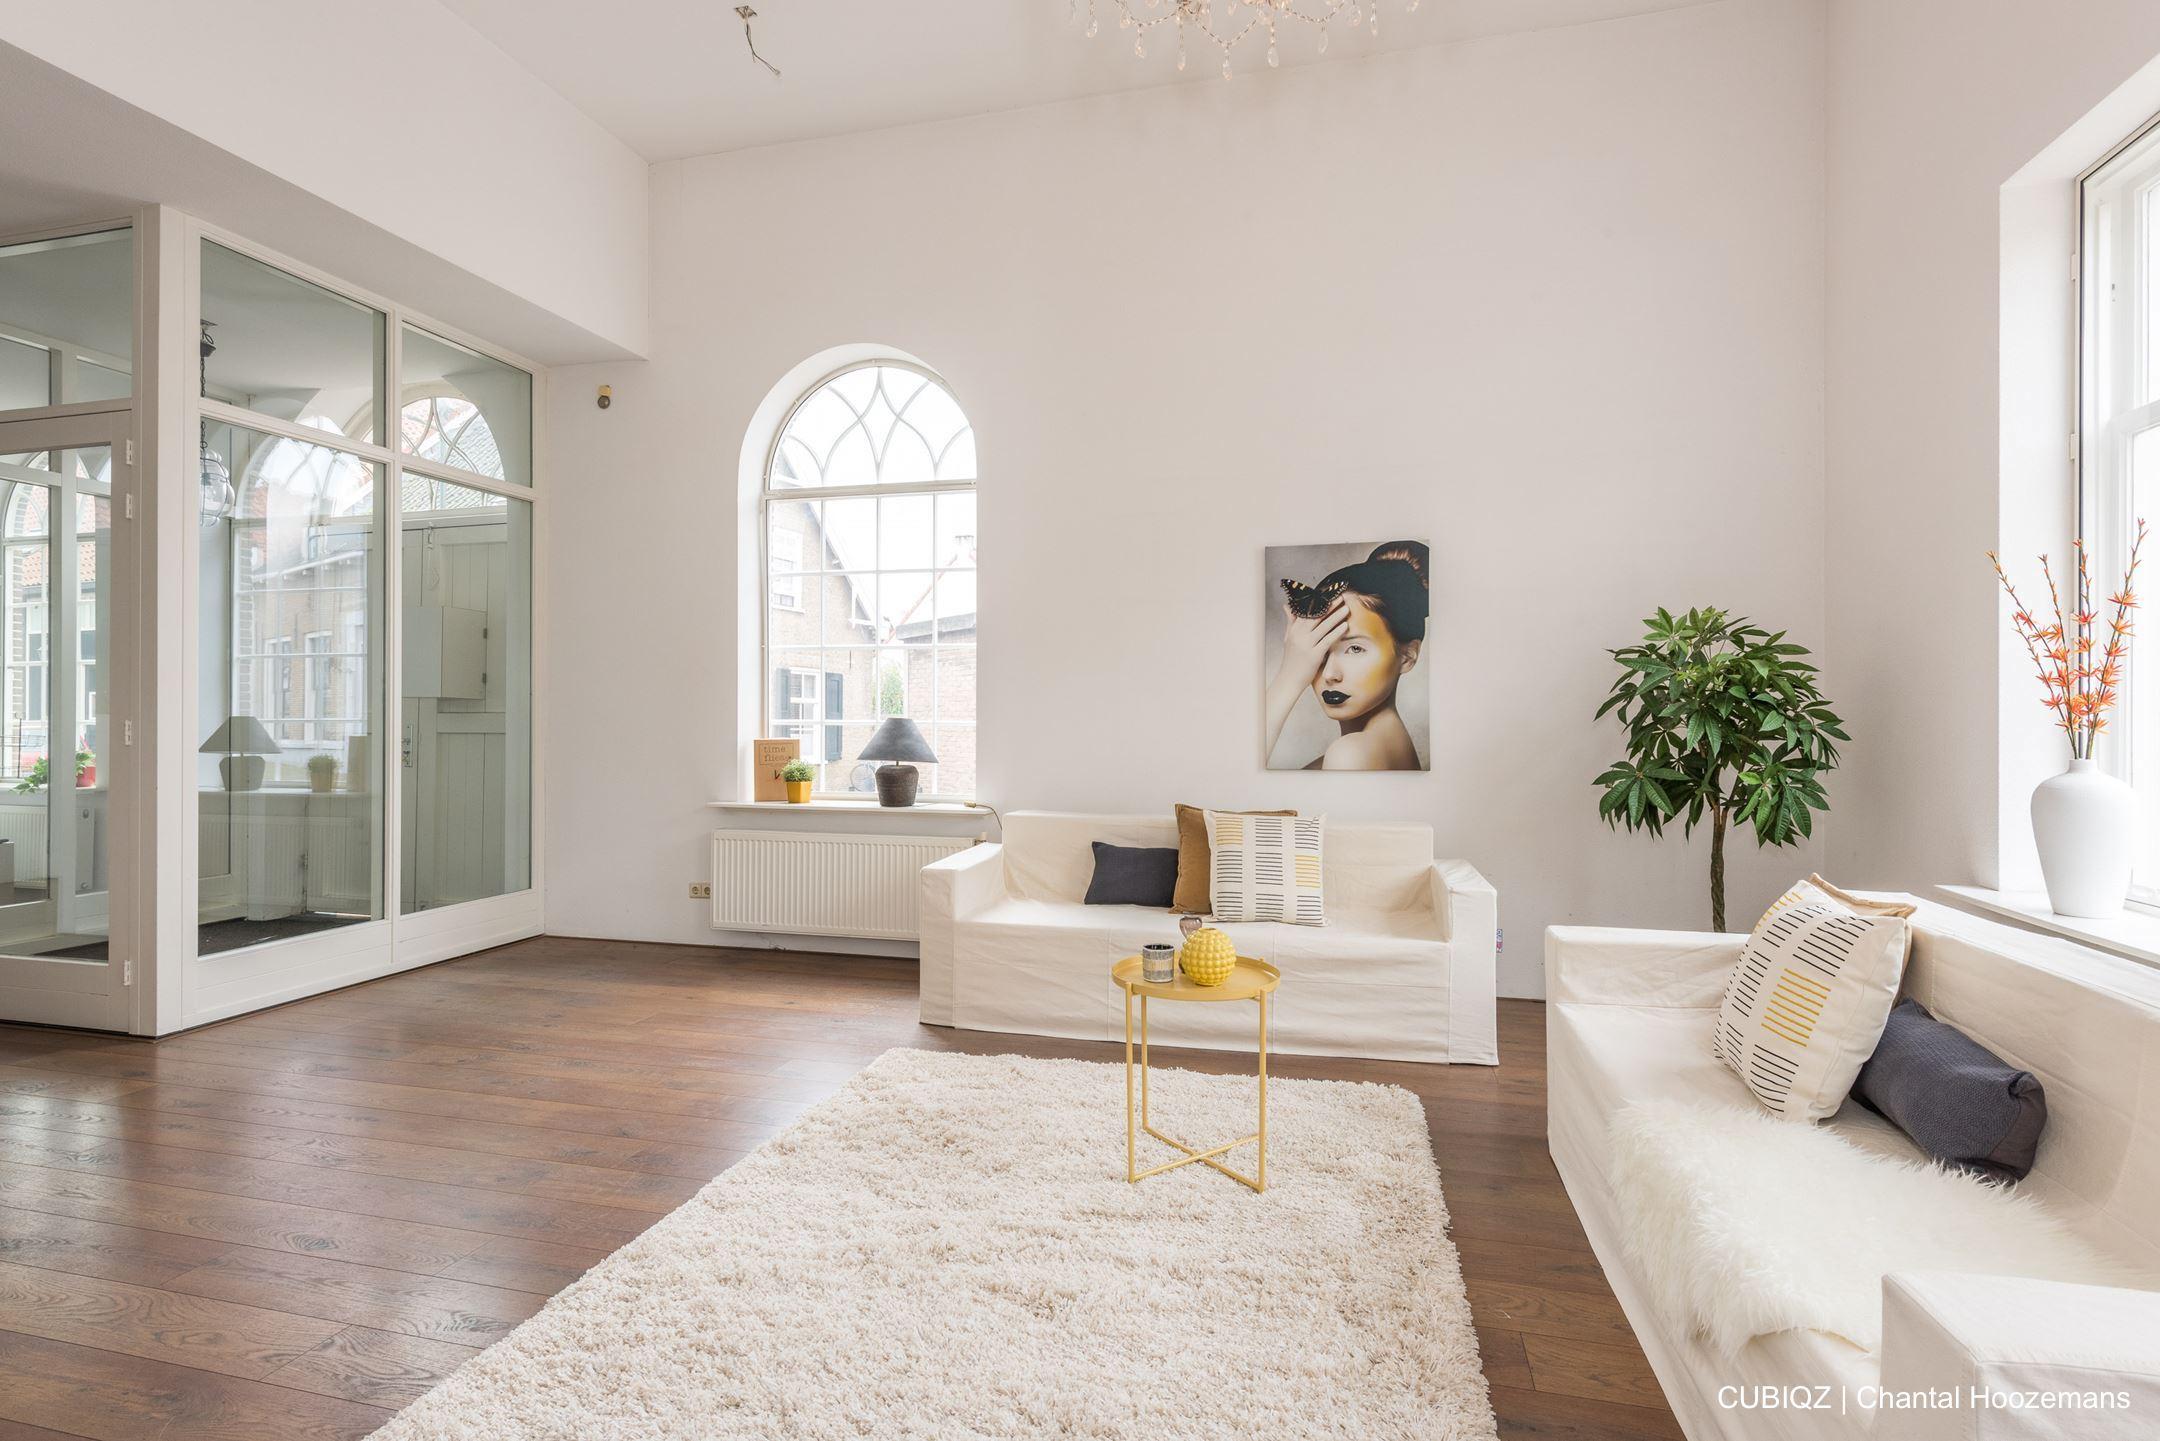 4. Muebles de cartón para Home Staging